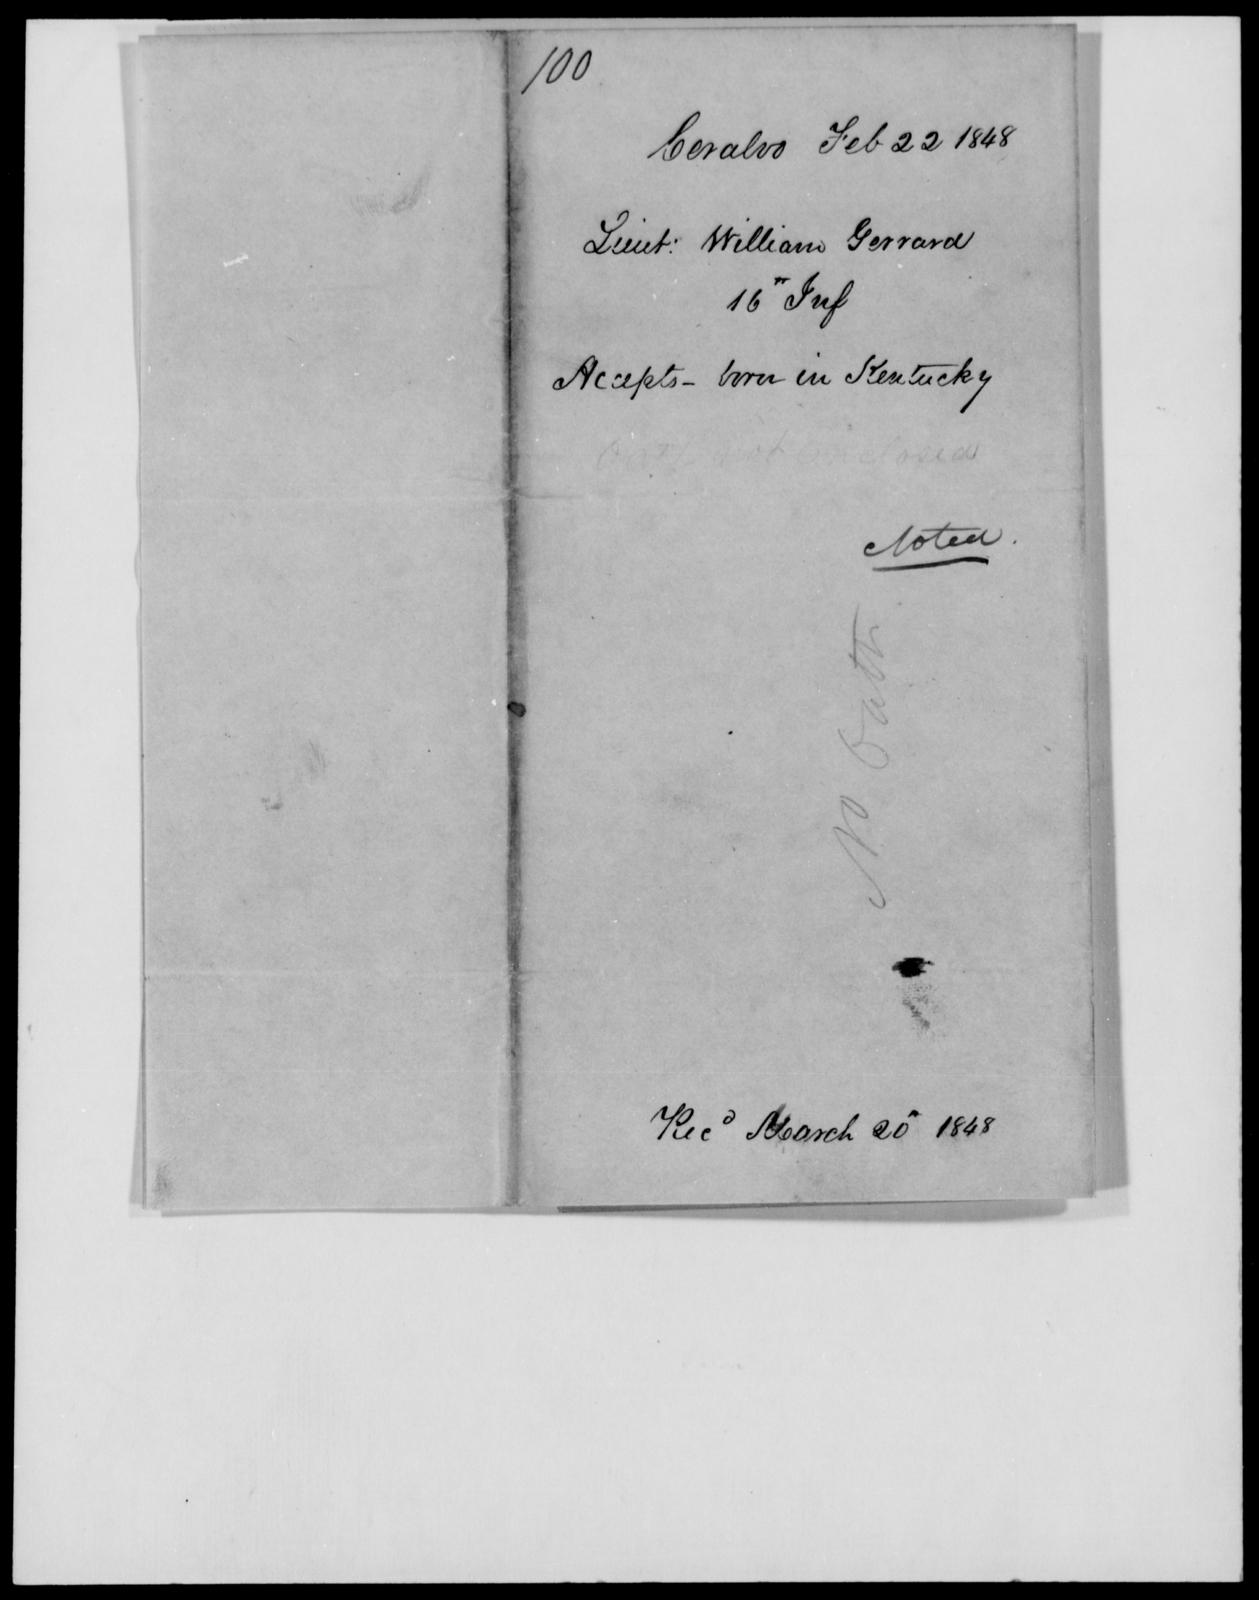 Gaward, William - State: Kentucky - Year: 1848 - File Number: G100